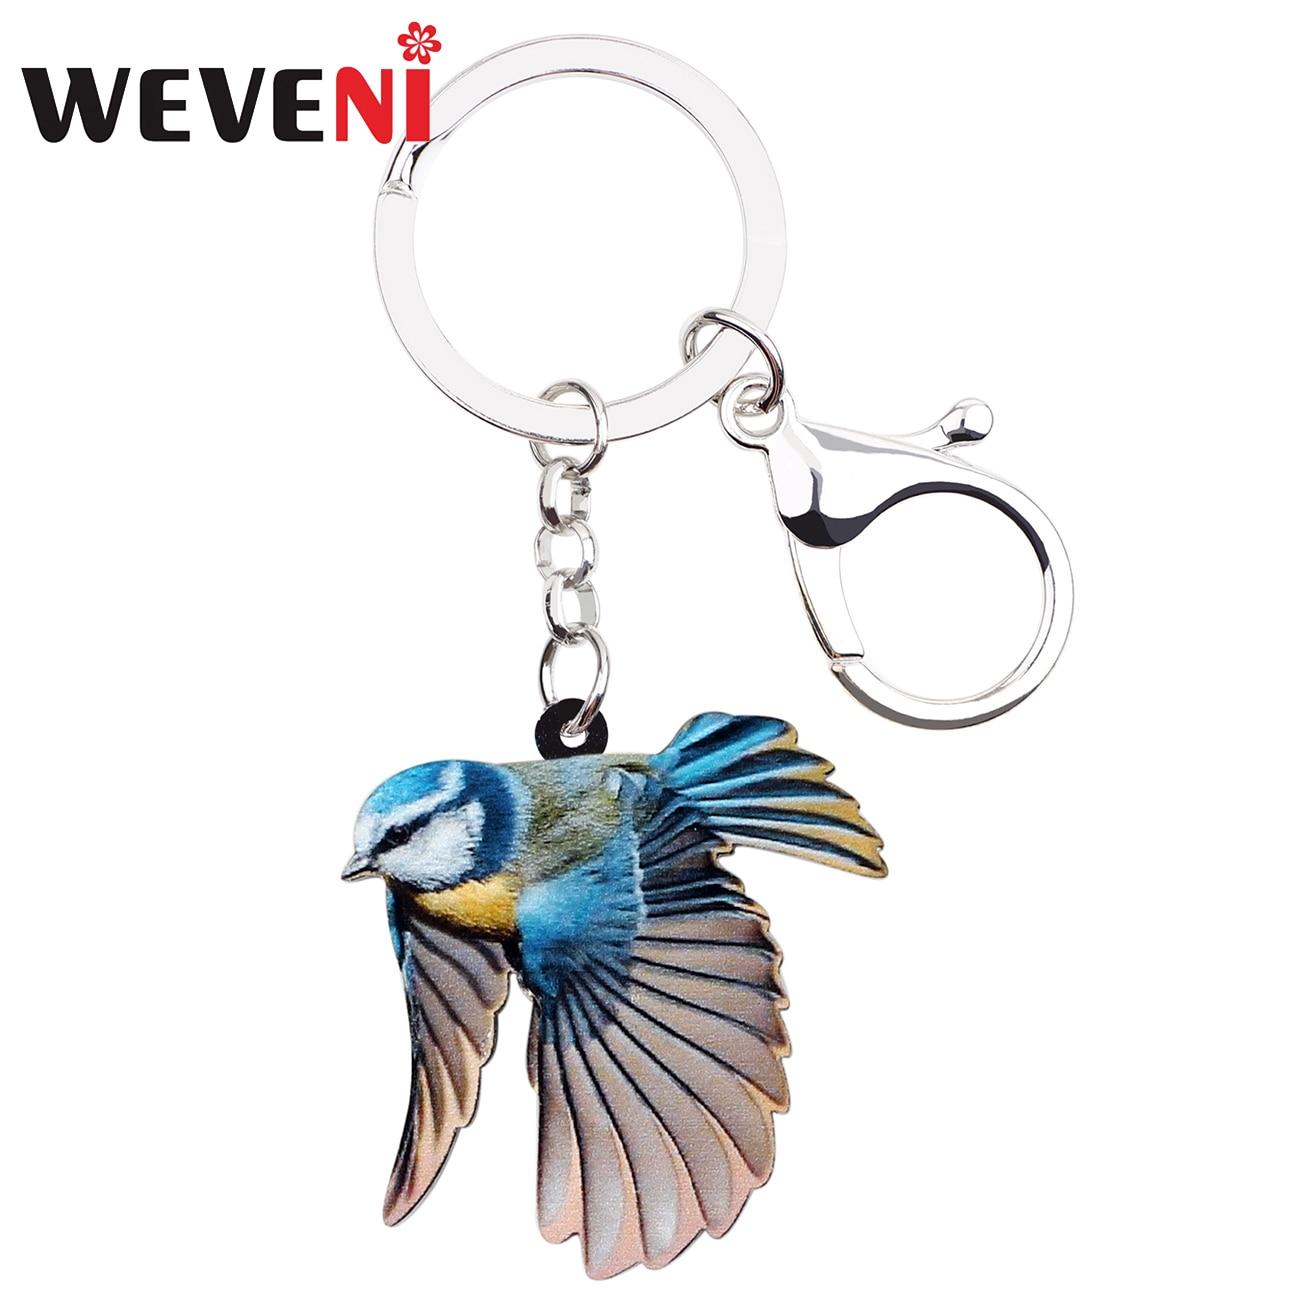 WEVENI Acrylic Blue Tit Bird Key Chains Keychains Ring Holder Fashion Animal Gift Jewelry For Women Girls Bag Car Purse Charms